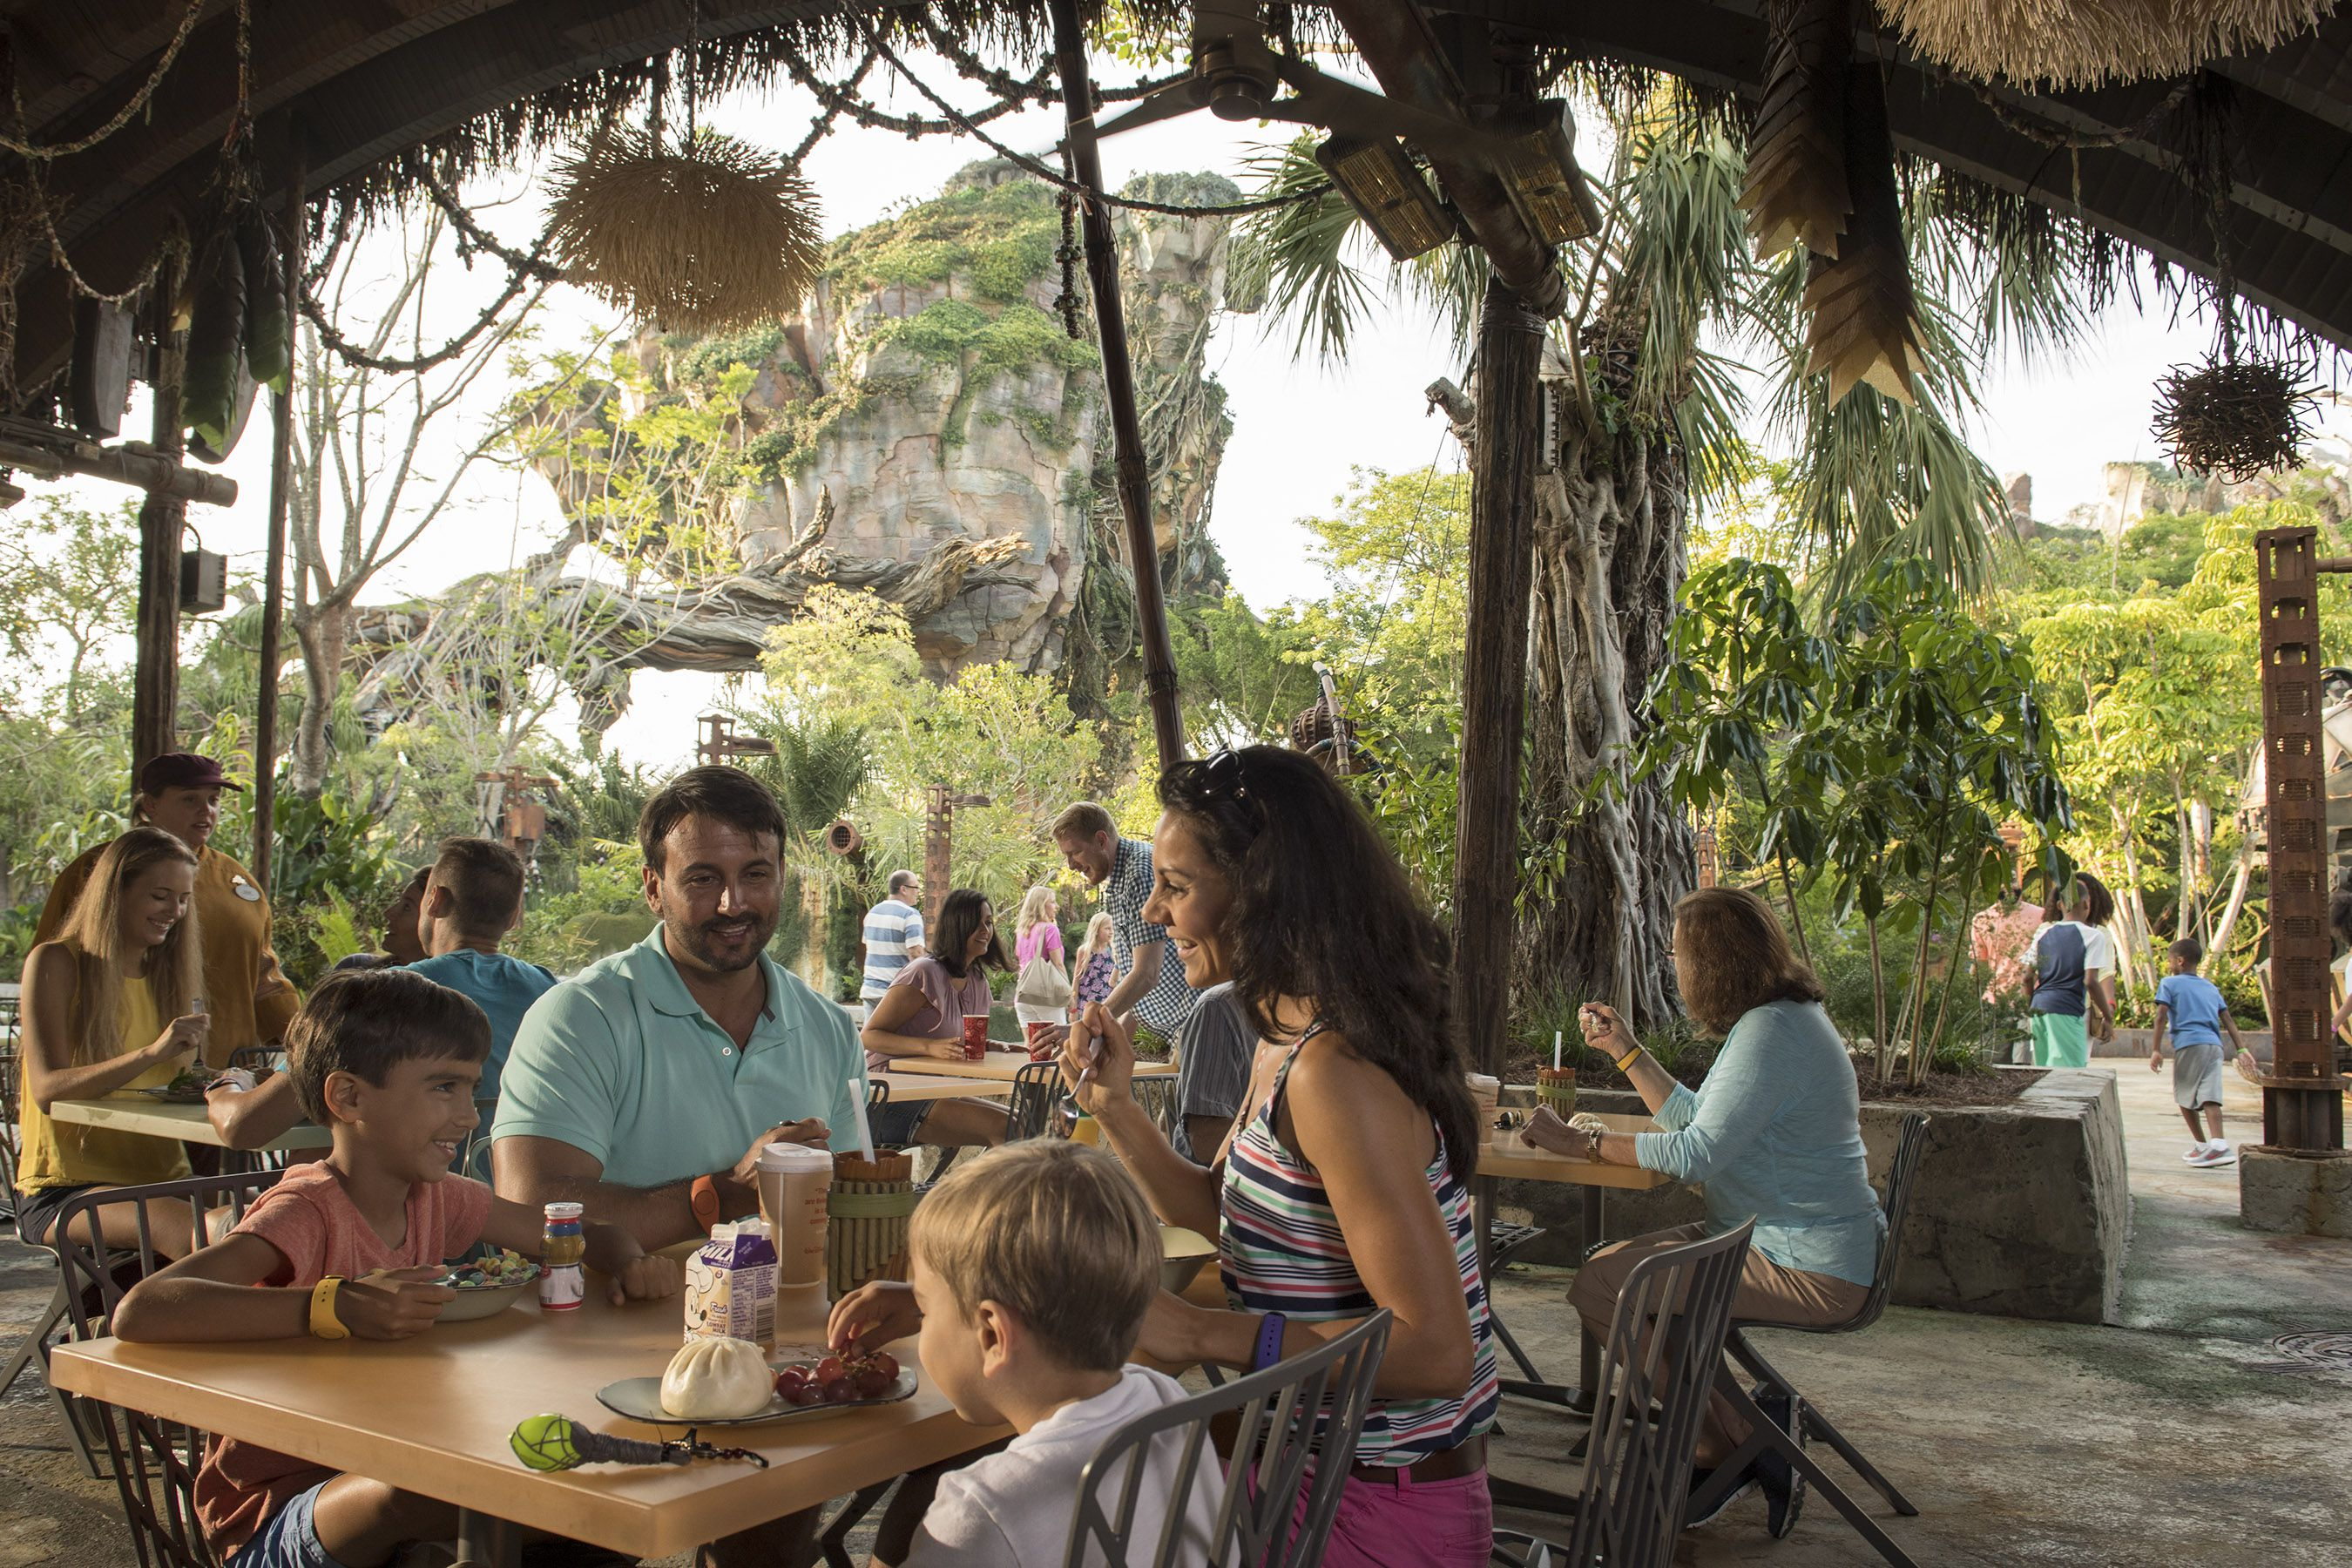 The Top 11 Quick Service Restaurants At Disney World